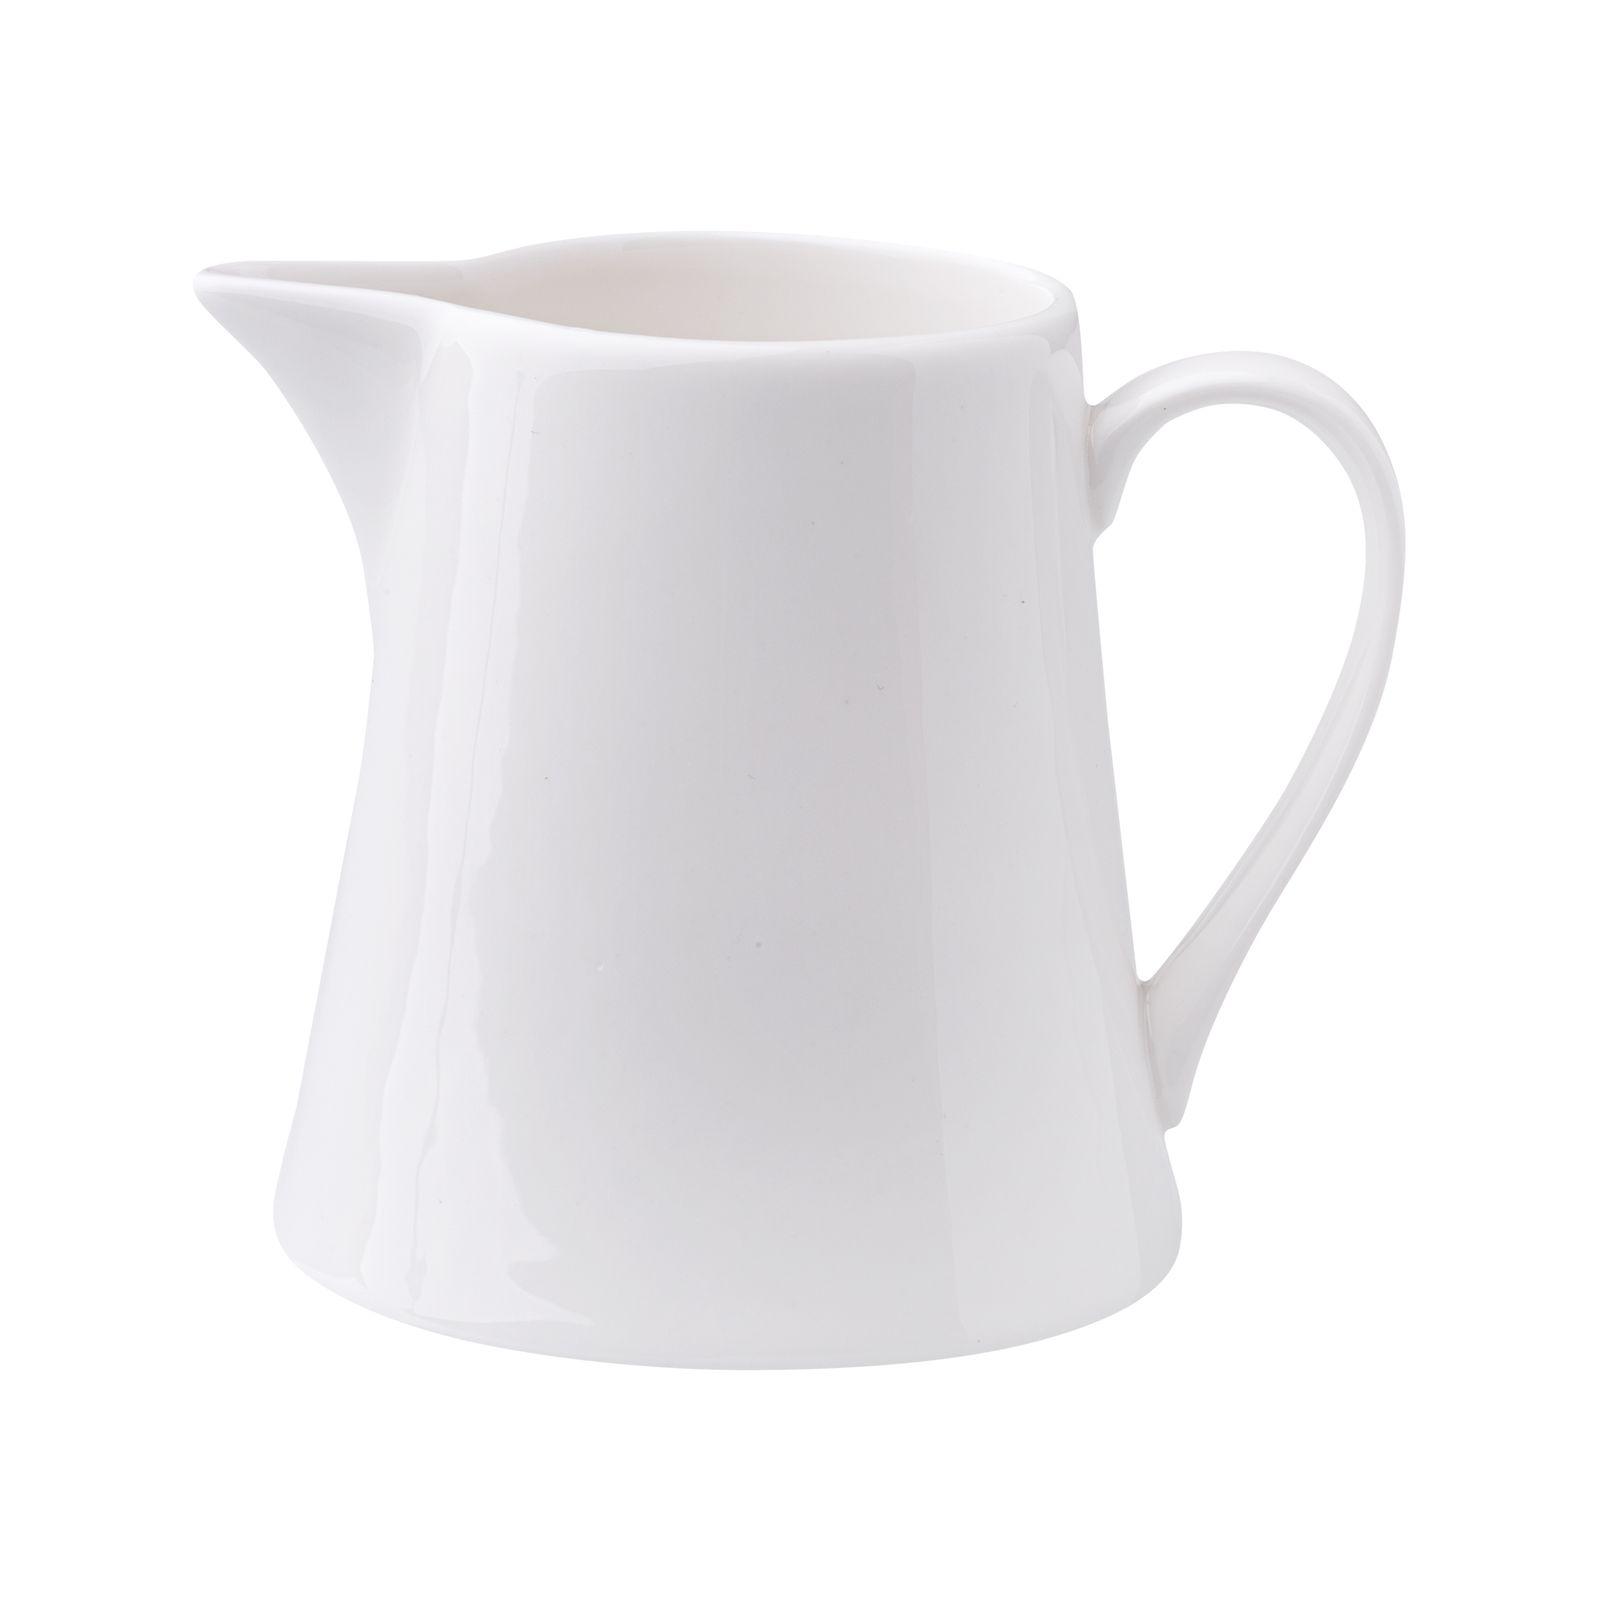 Milk jug Wave / Kubiko 200 ml AMBITION